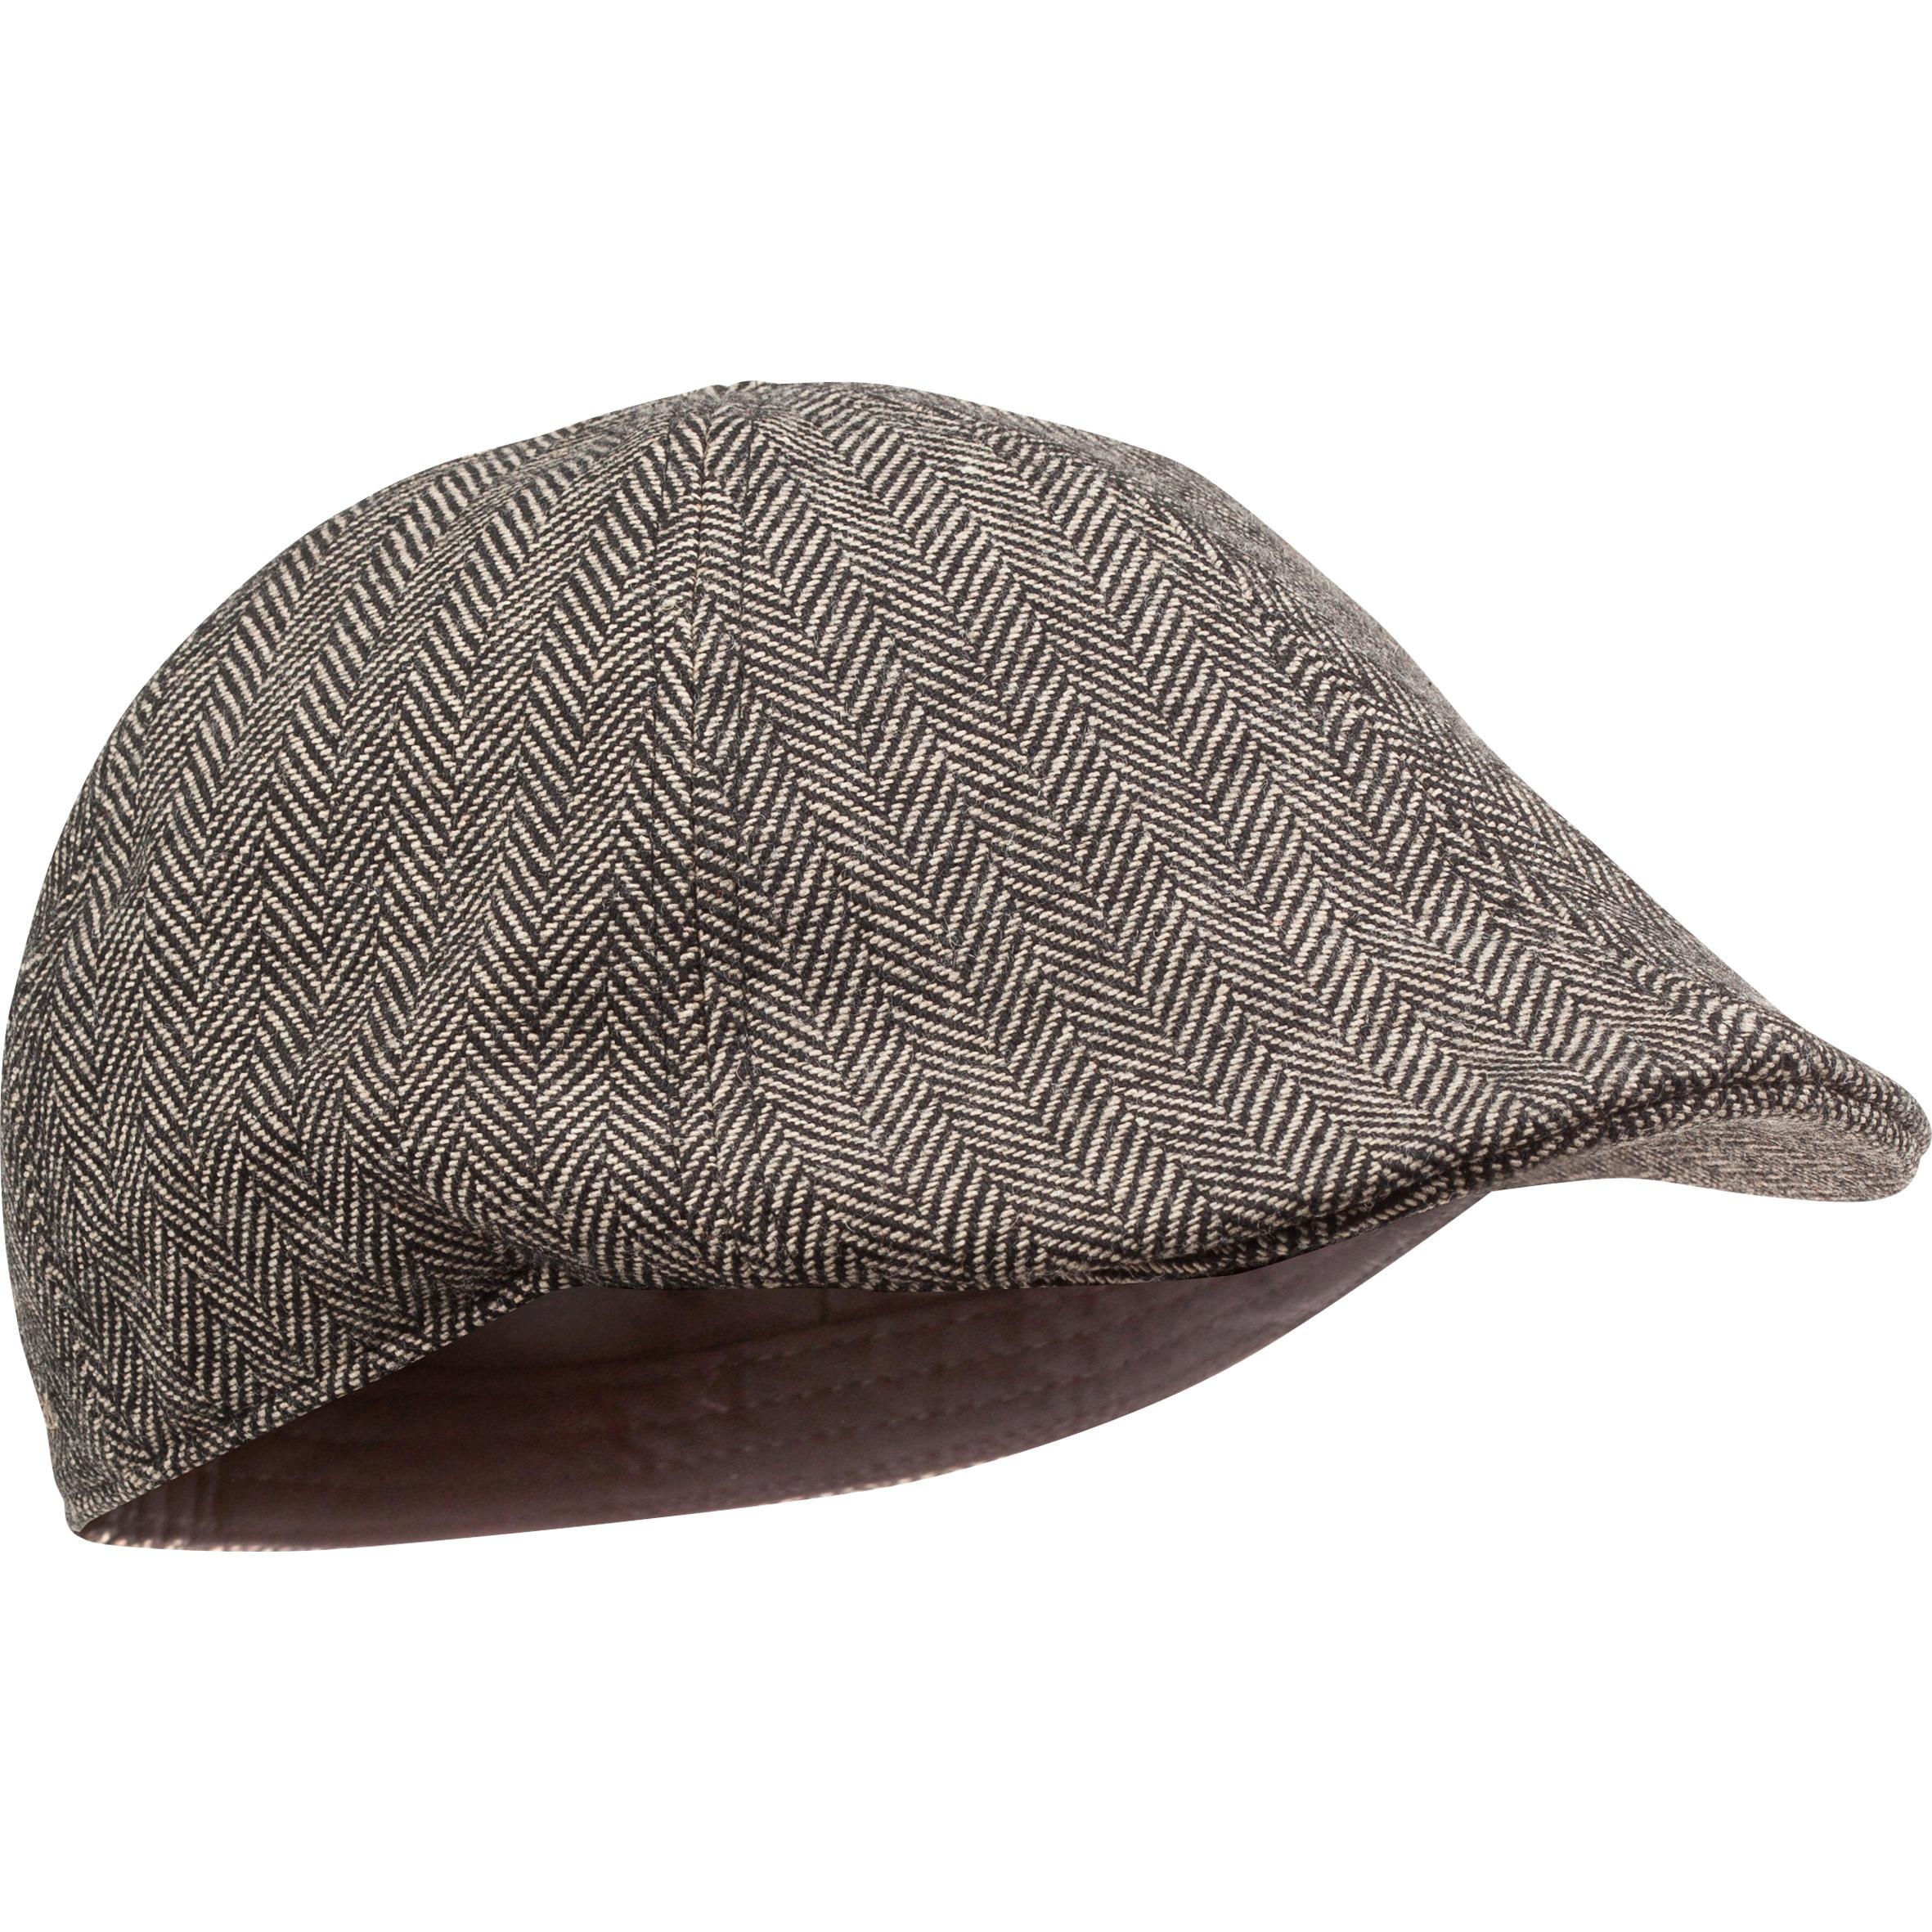 Șapcă Plată Tweed Bej